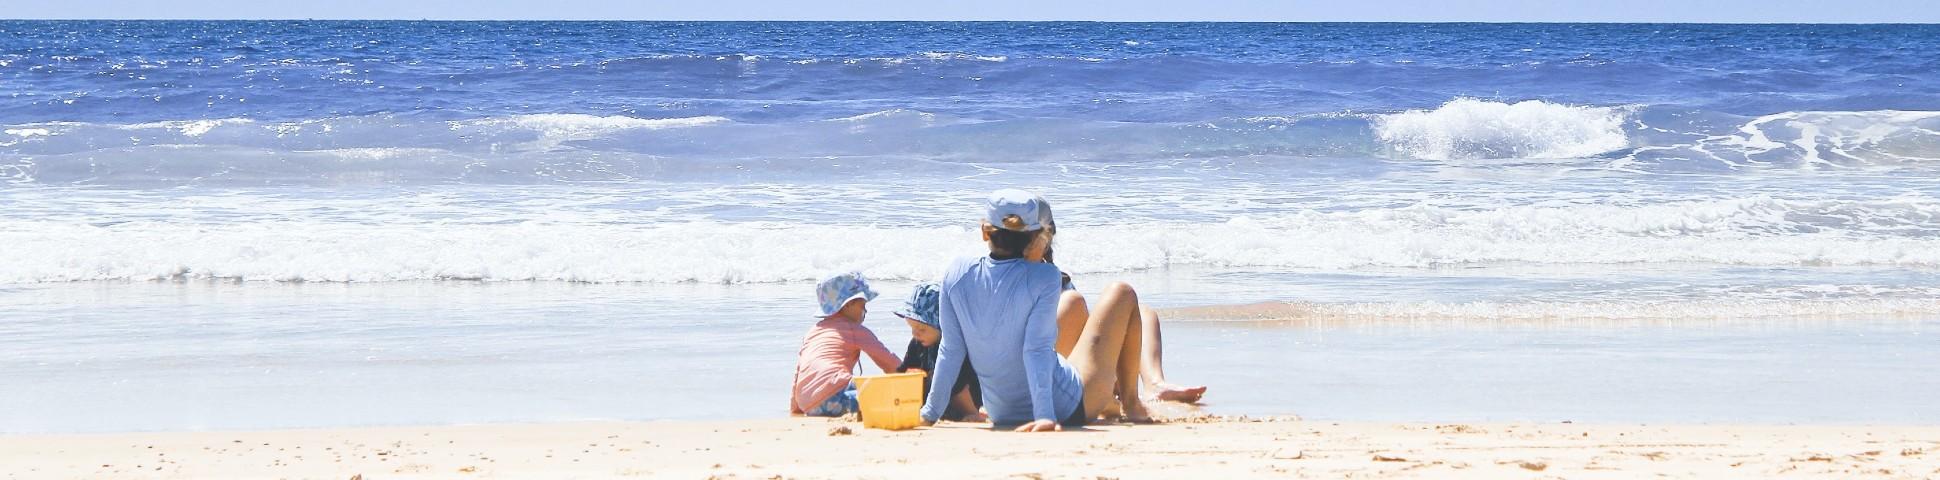 Family enjoying the sunny weather near the beach